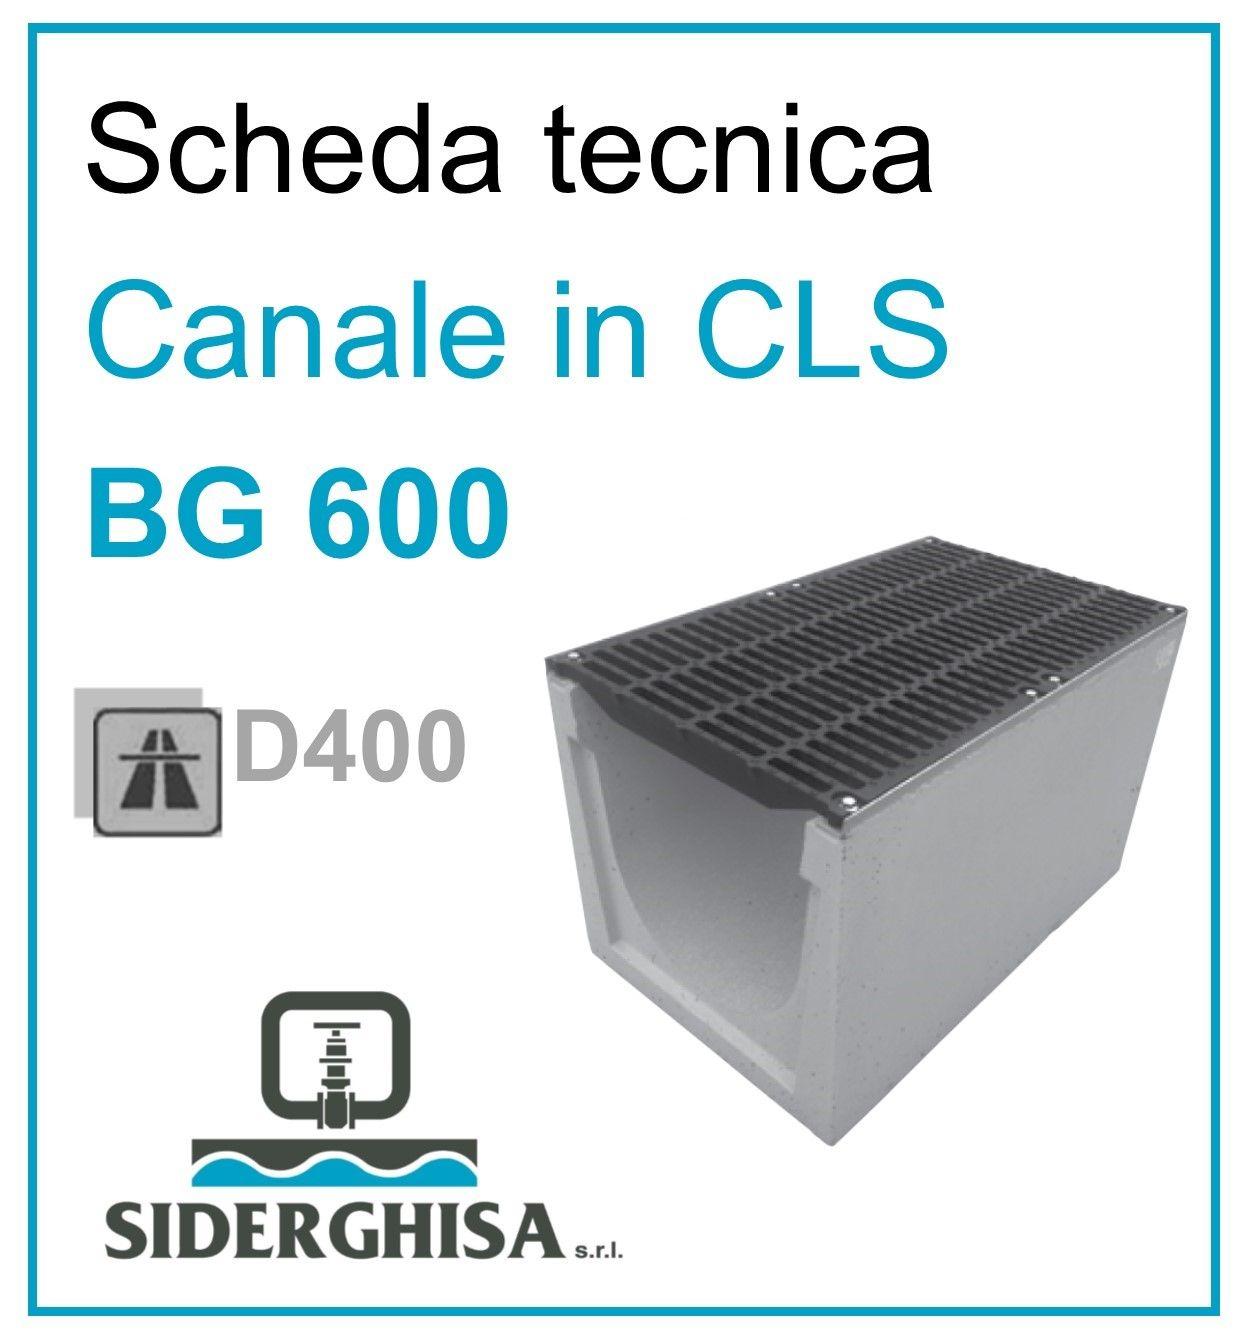 frontespizio scheda tecnica canale bg 600 D400